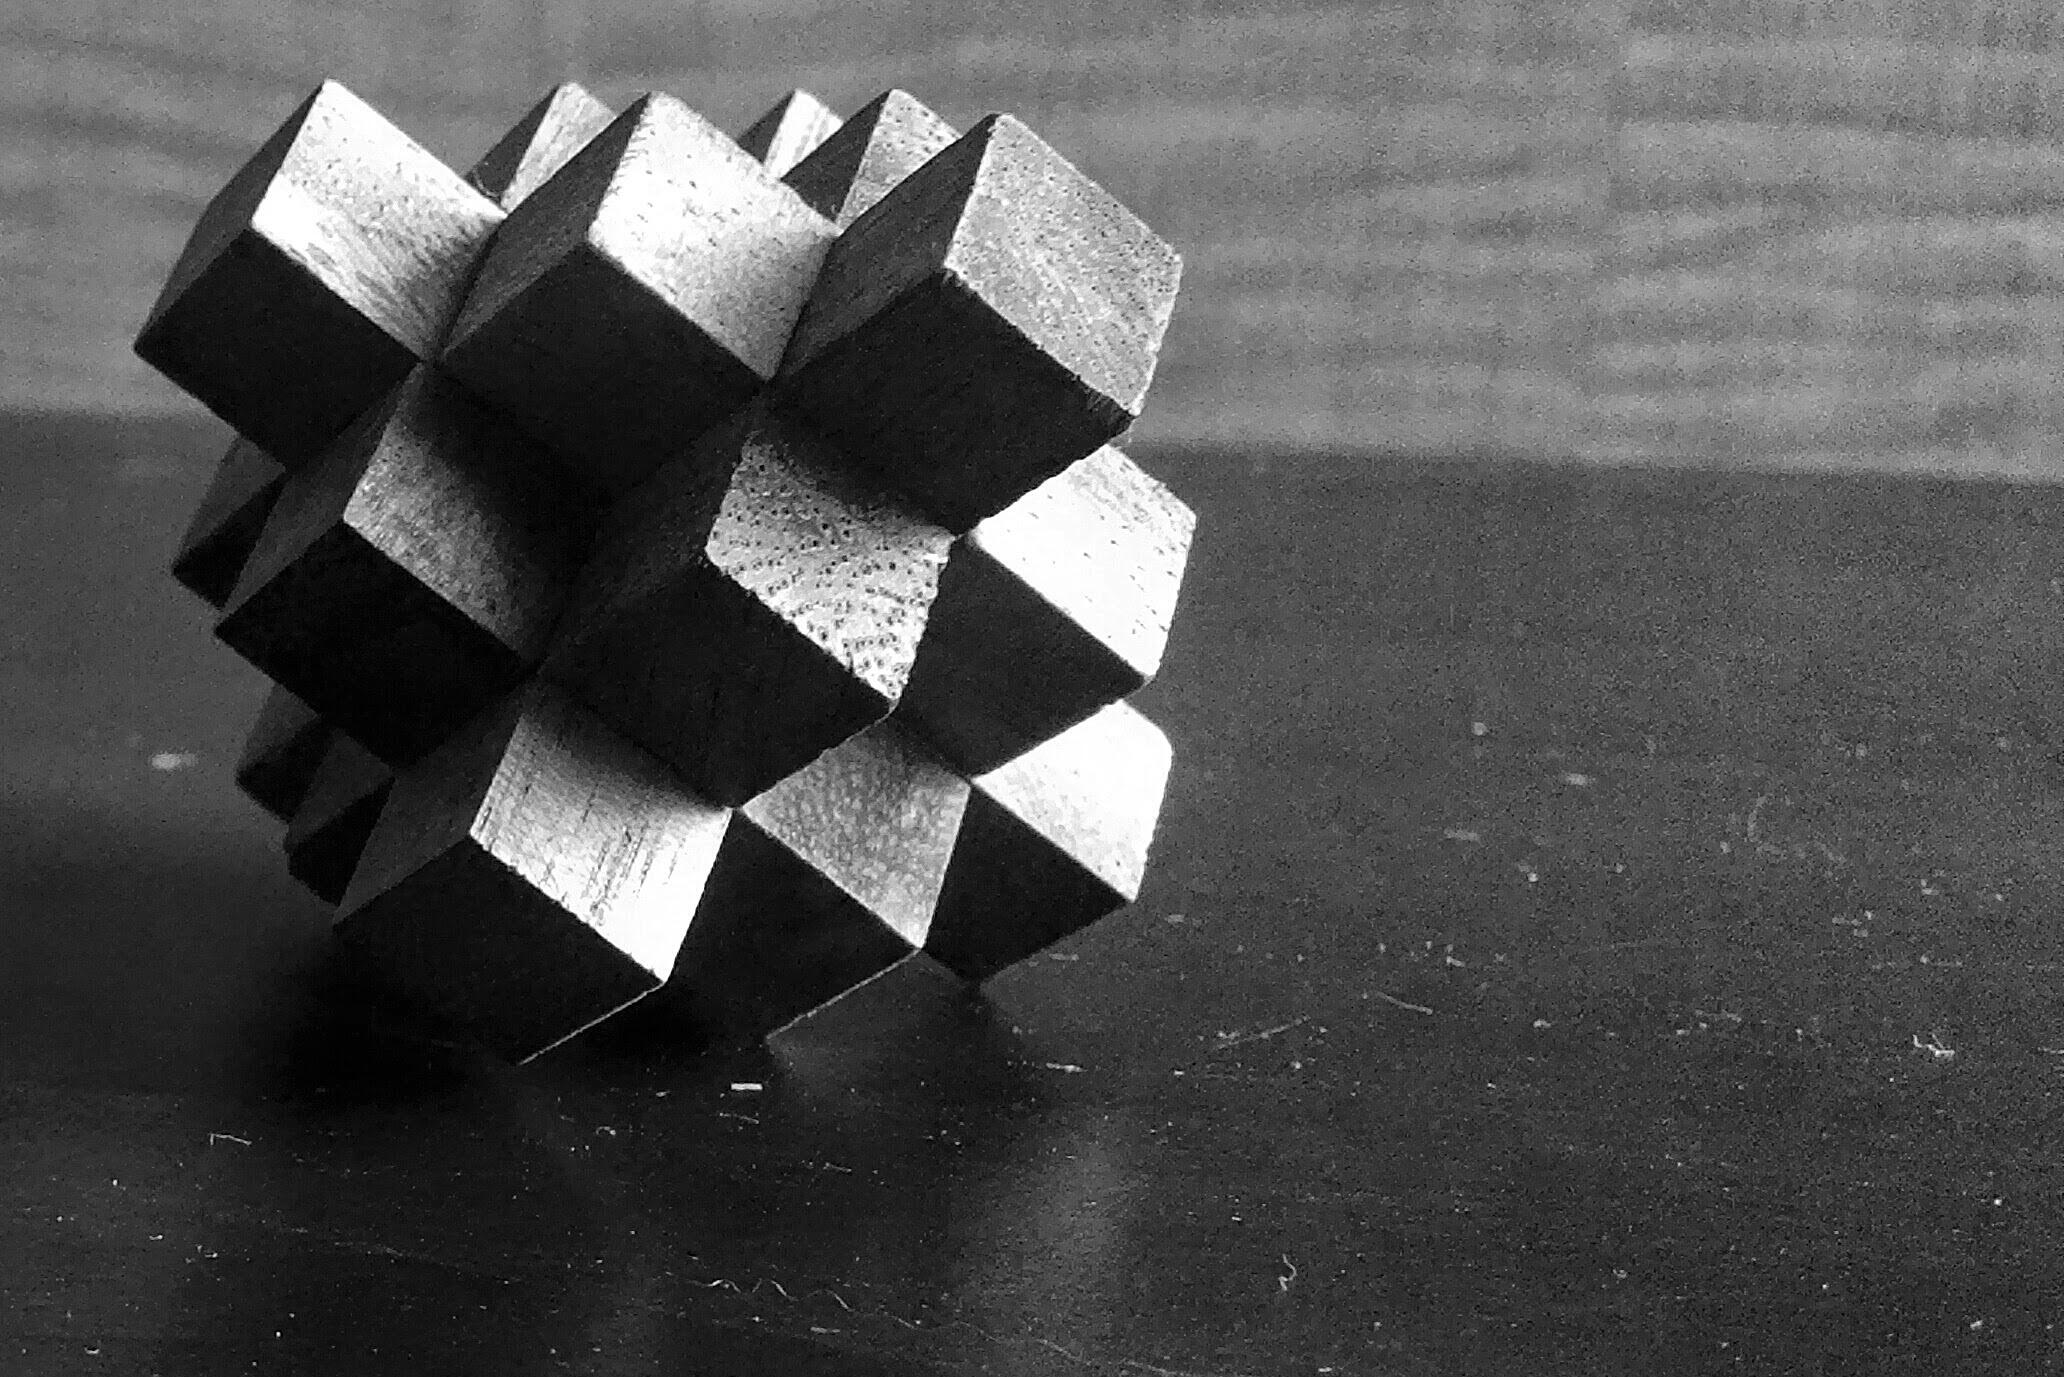 blocks-puzzle-shadows-915780.jpg